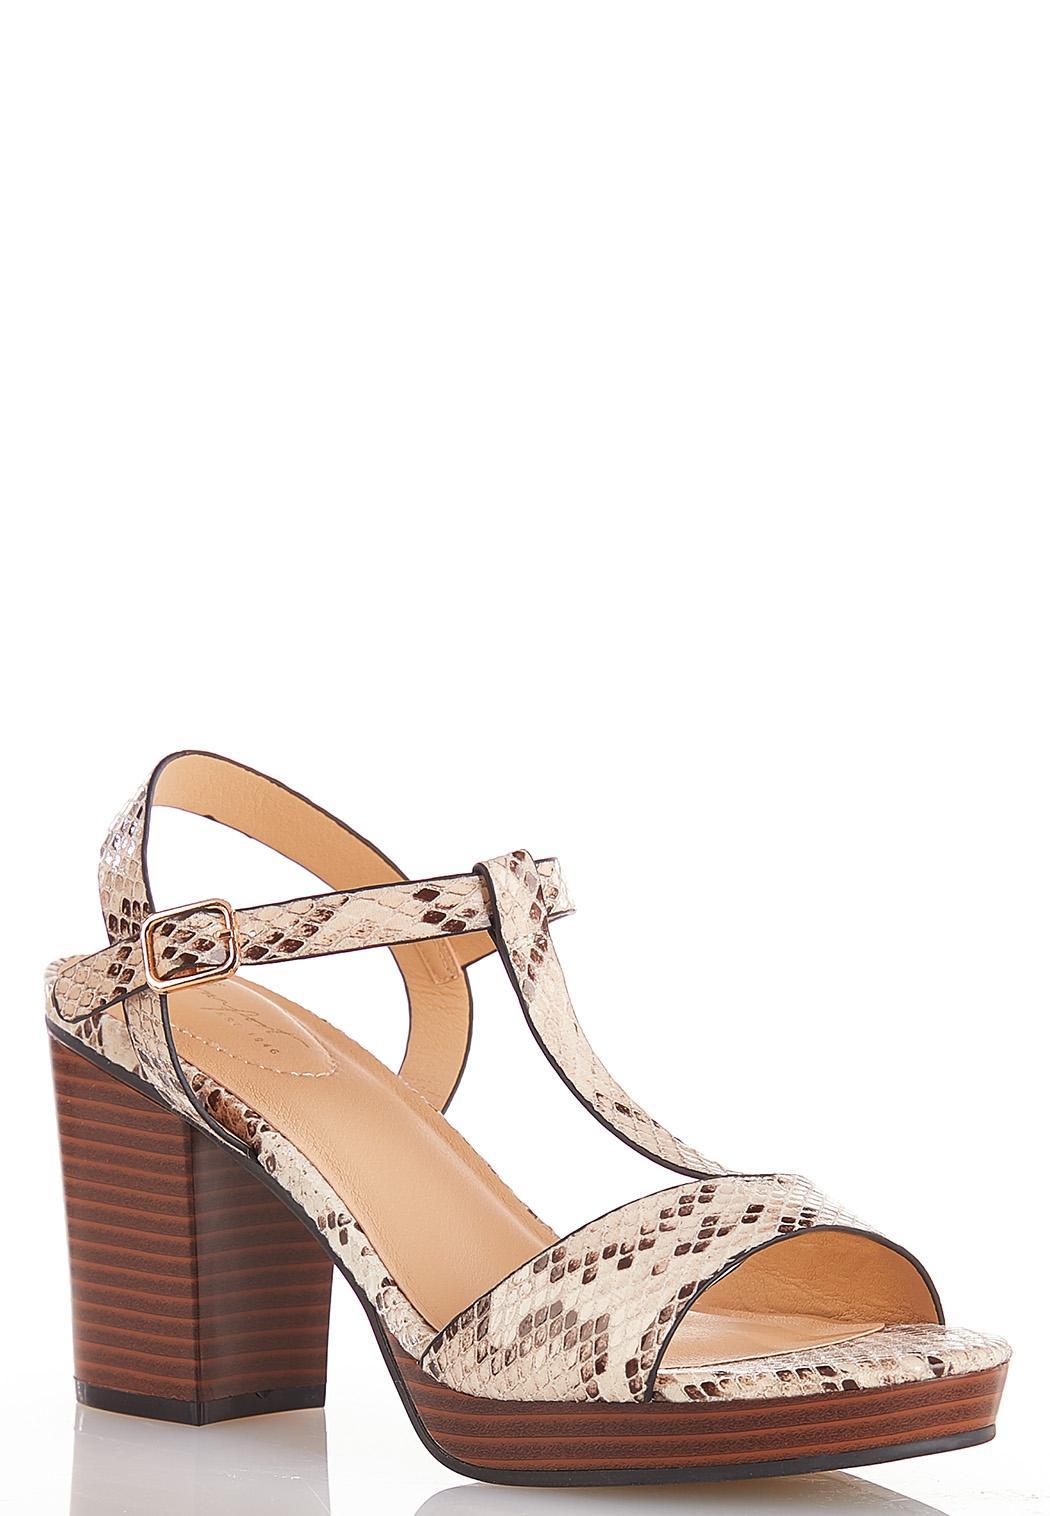 T-Strap Platform Sandals Heels Cato Fashions